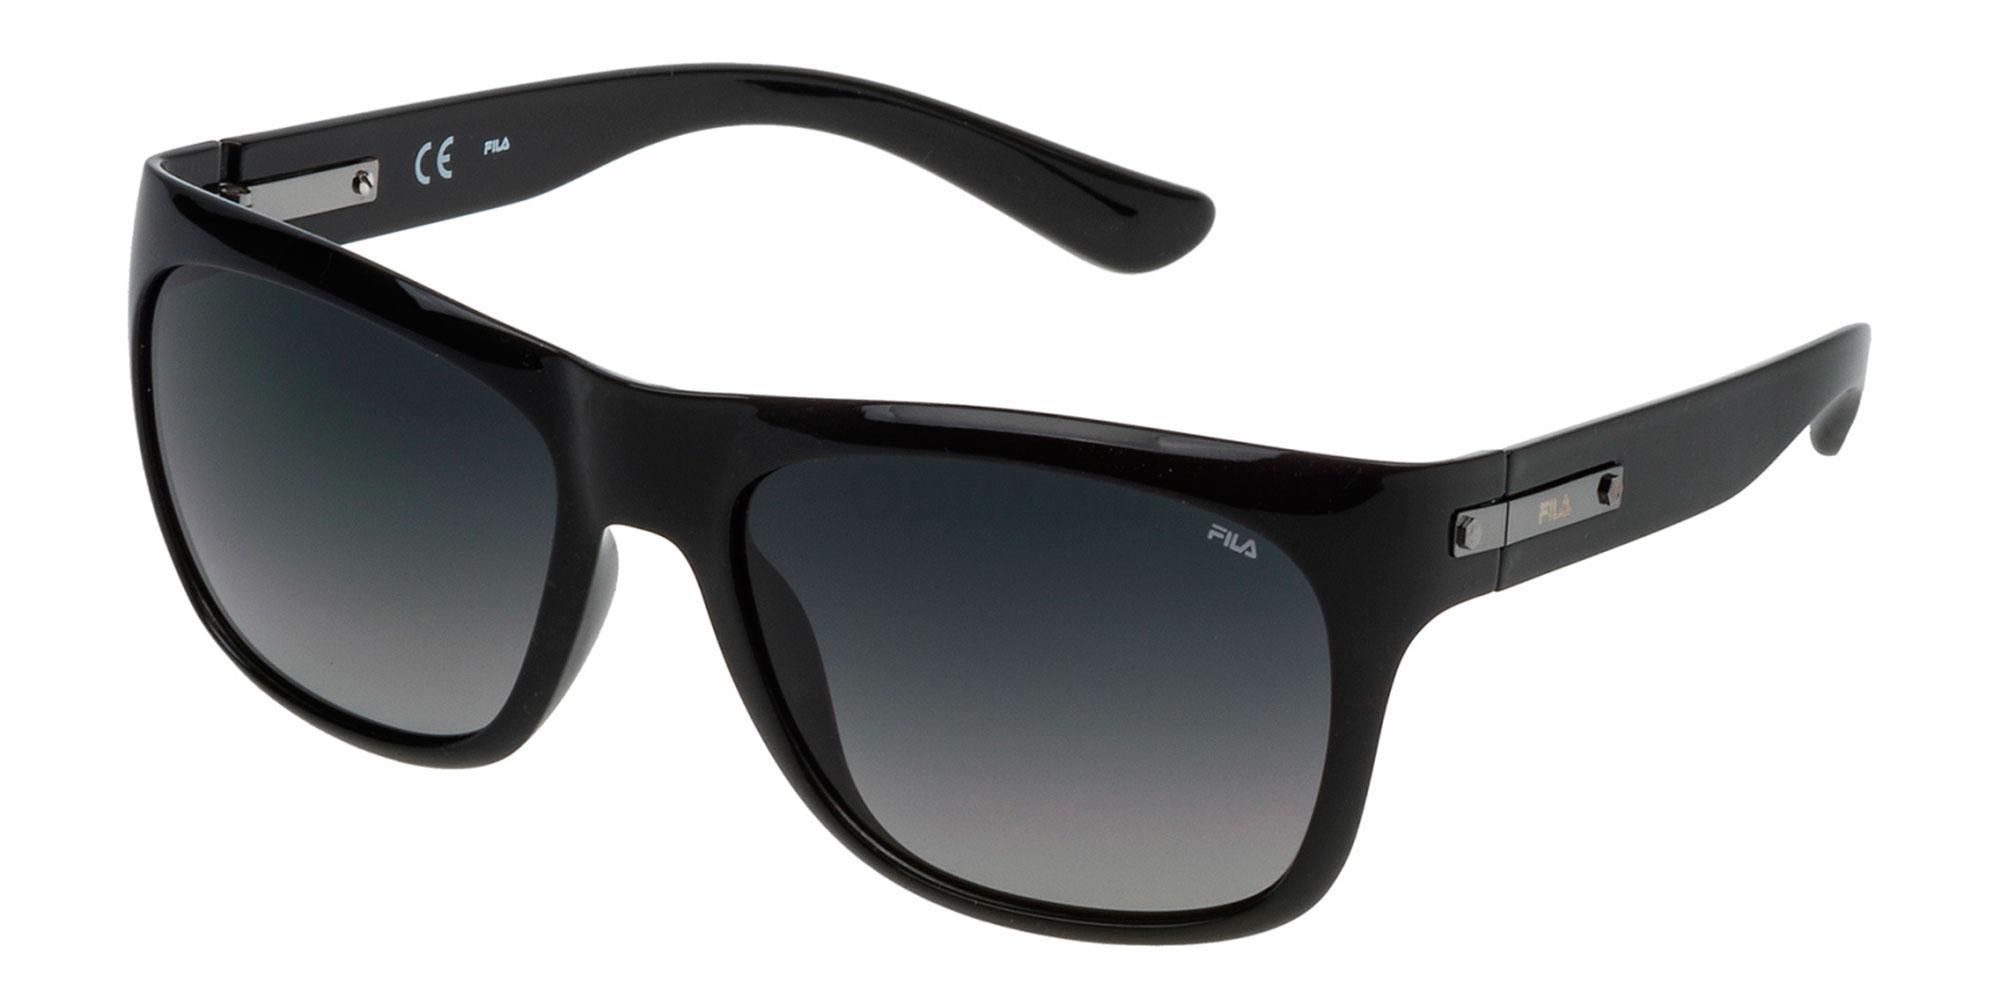 700P SF9053 Sunglasses, Fila